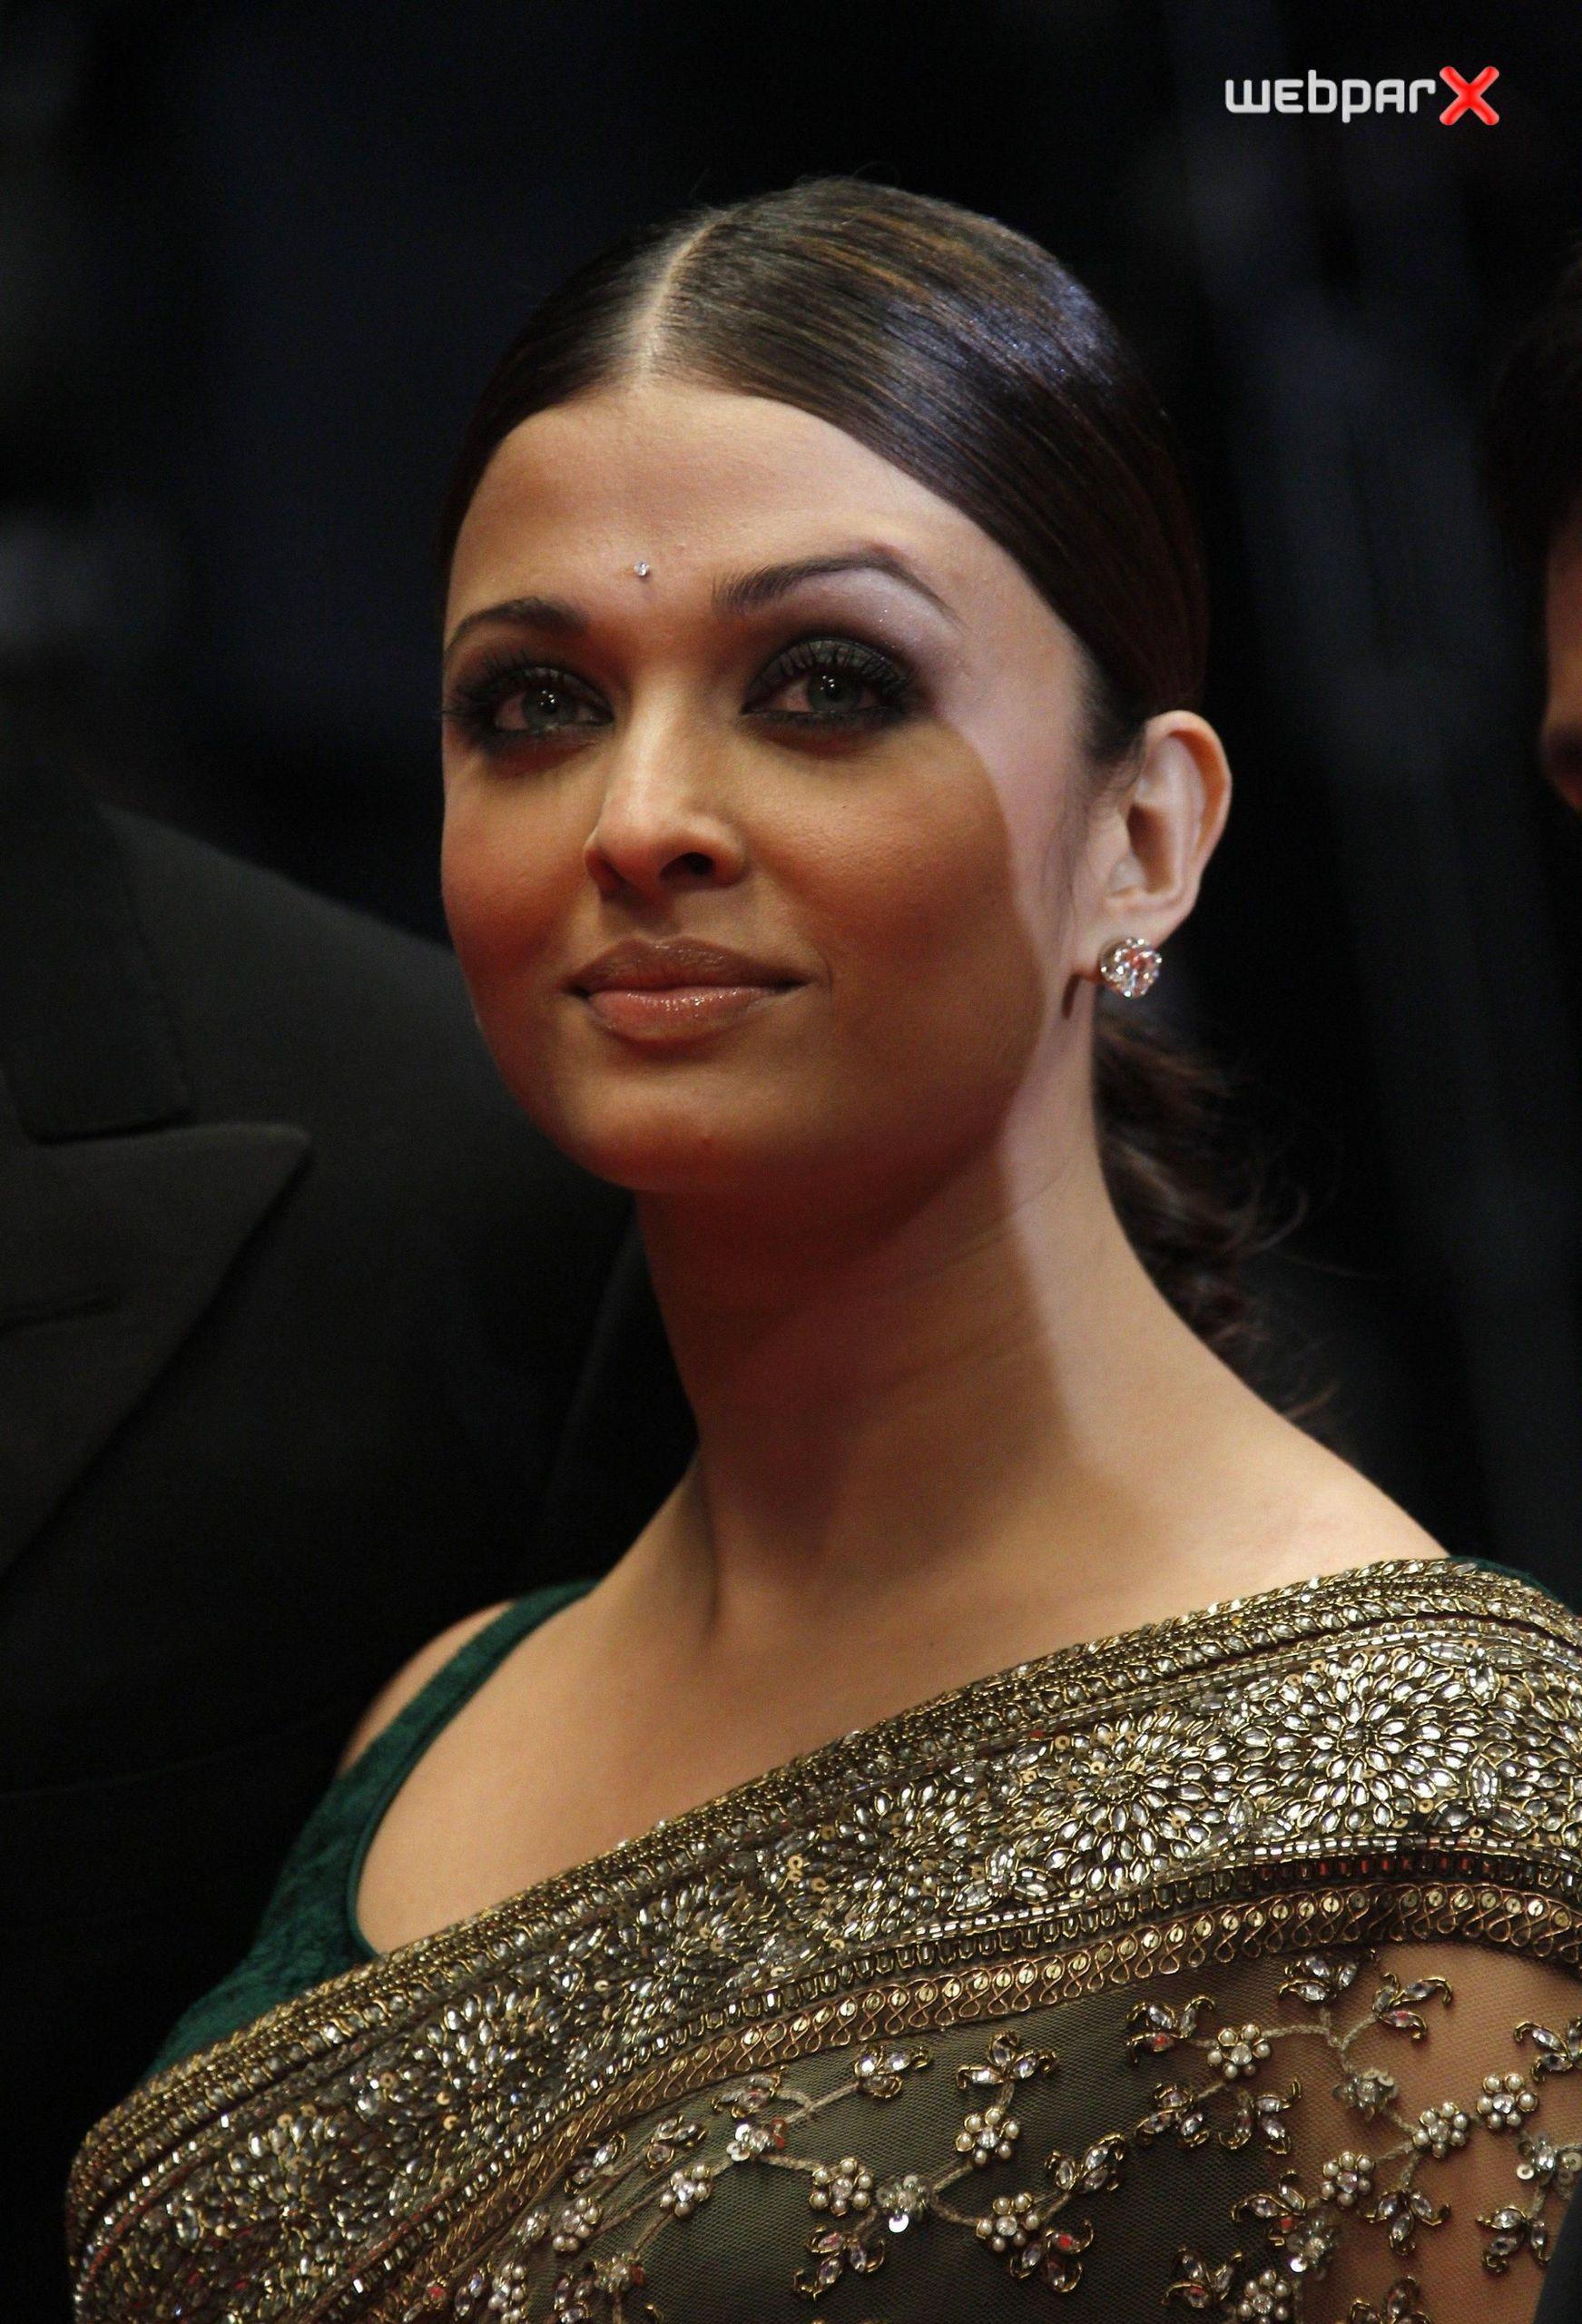 Aishwarya Rai Full HD Images - Webparx